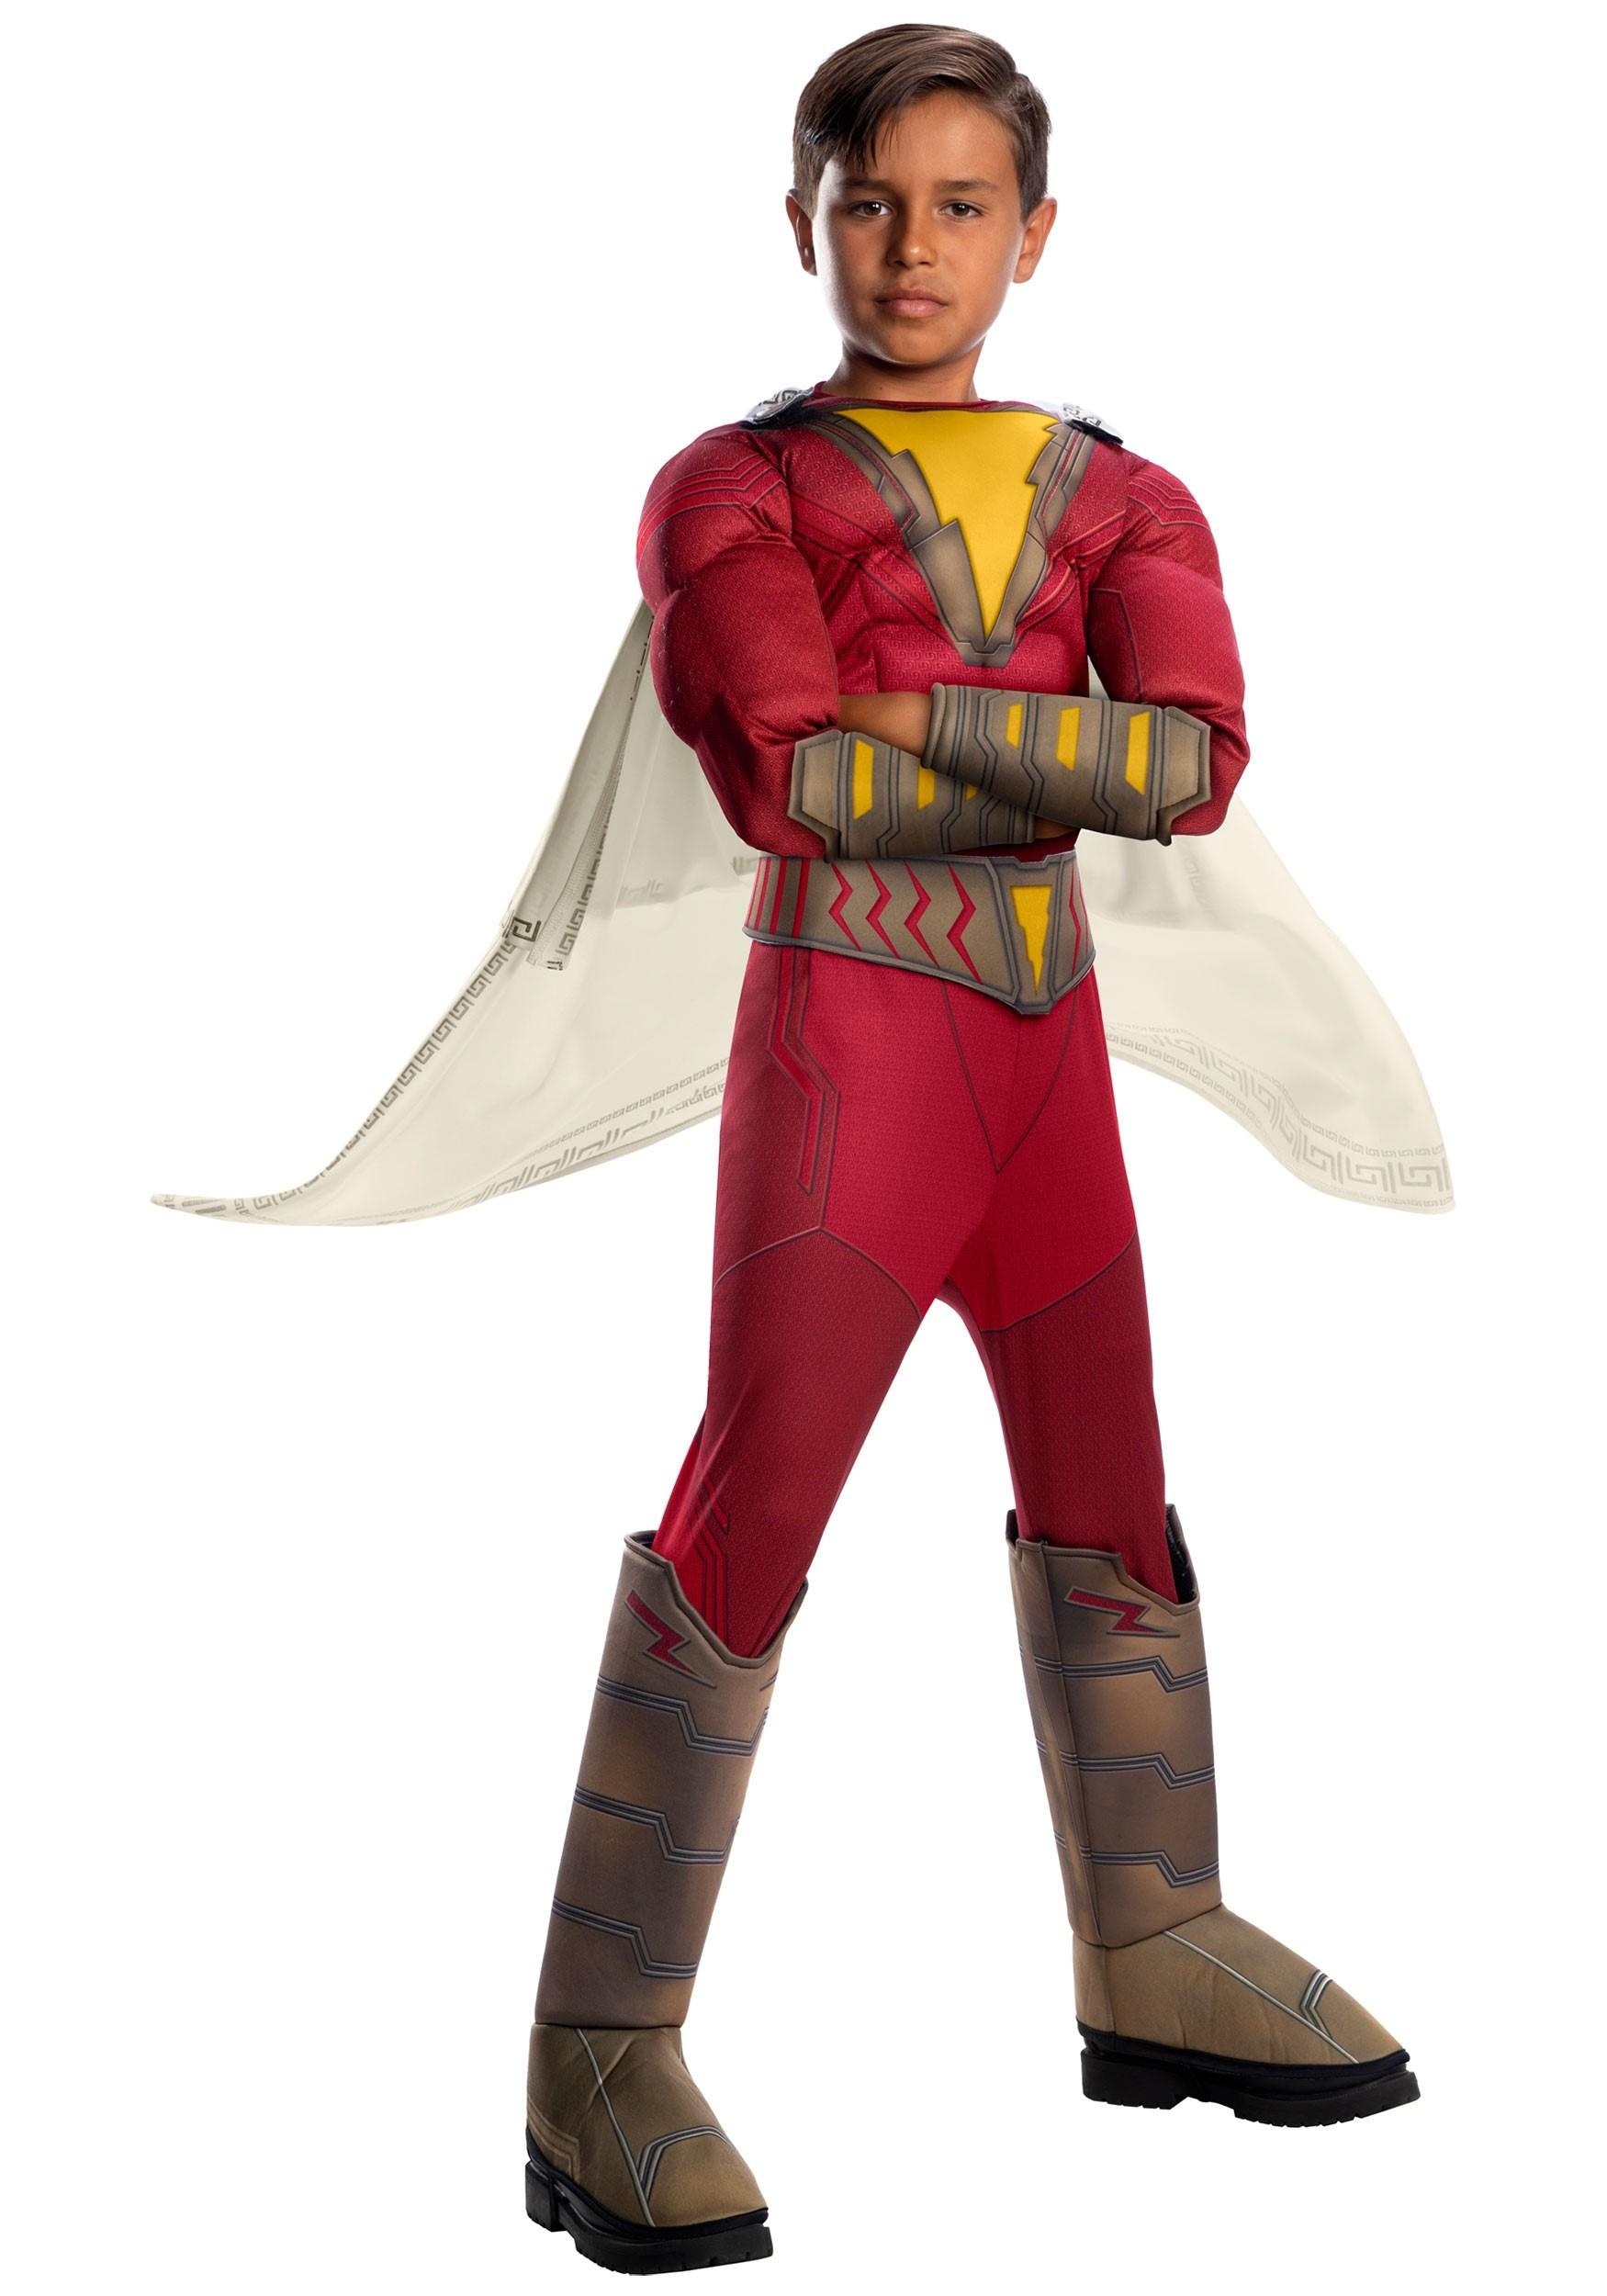 907364756e1 Child's Shazam! Deluxe Costume